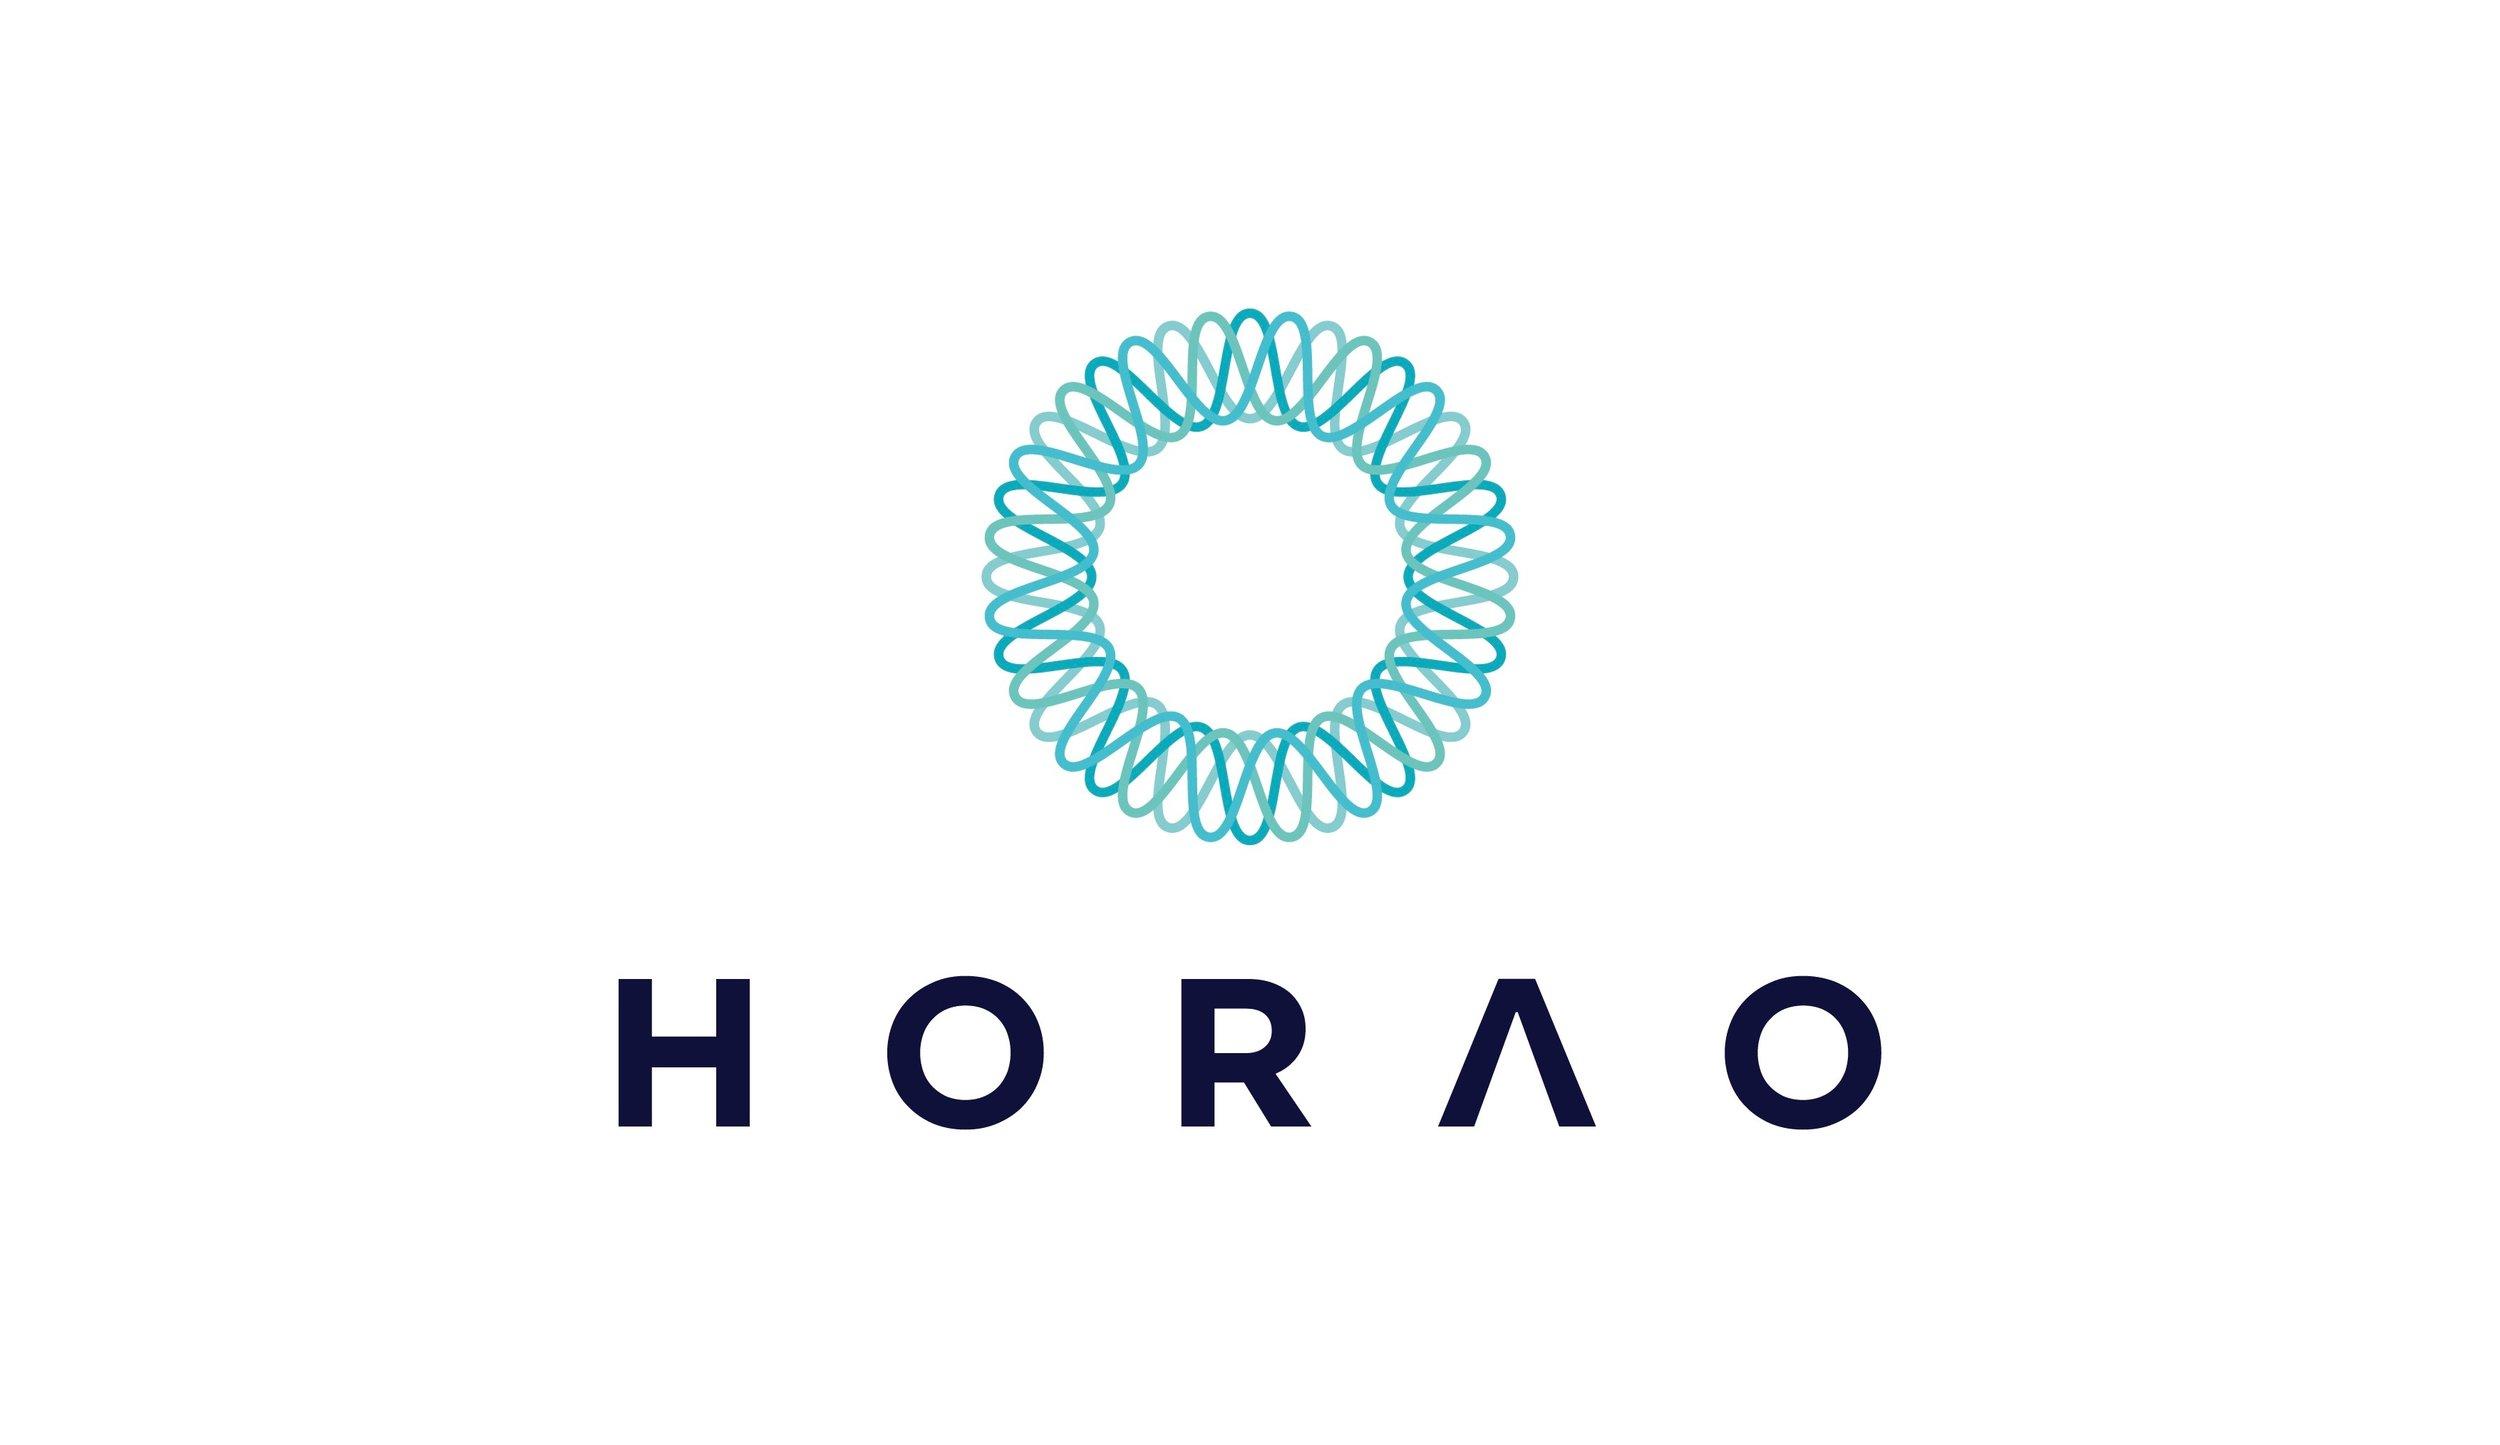 Horao - Finale neg.jpg